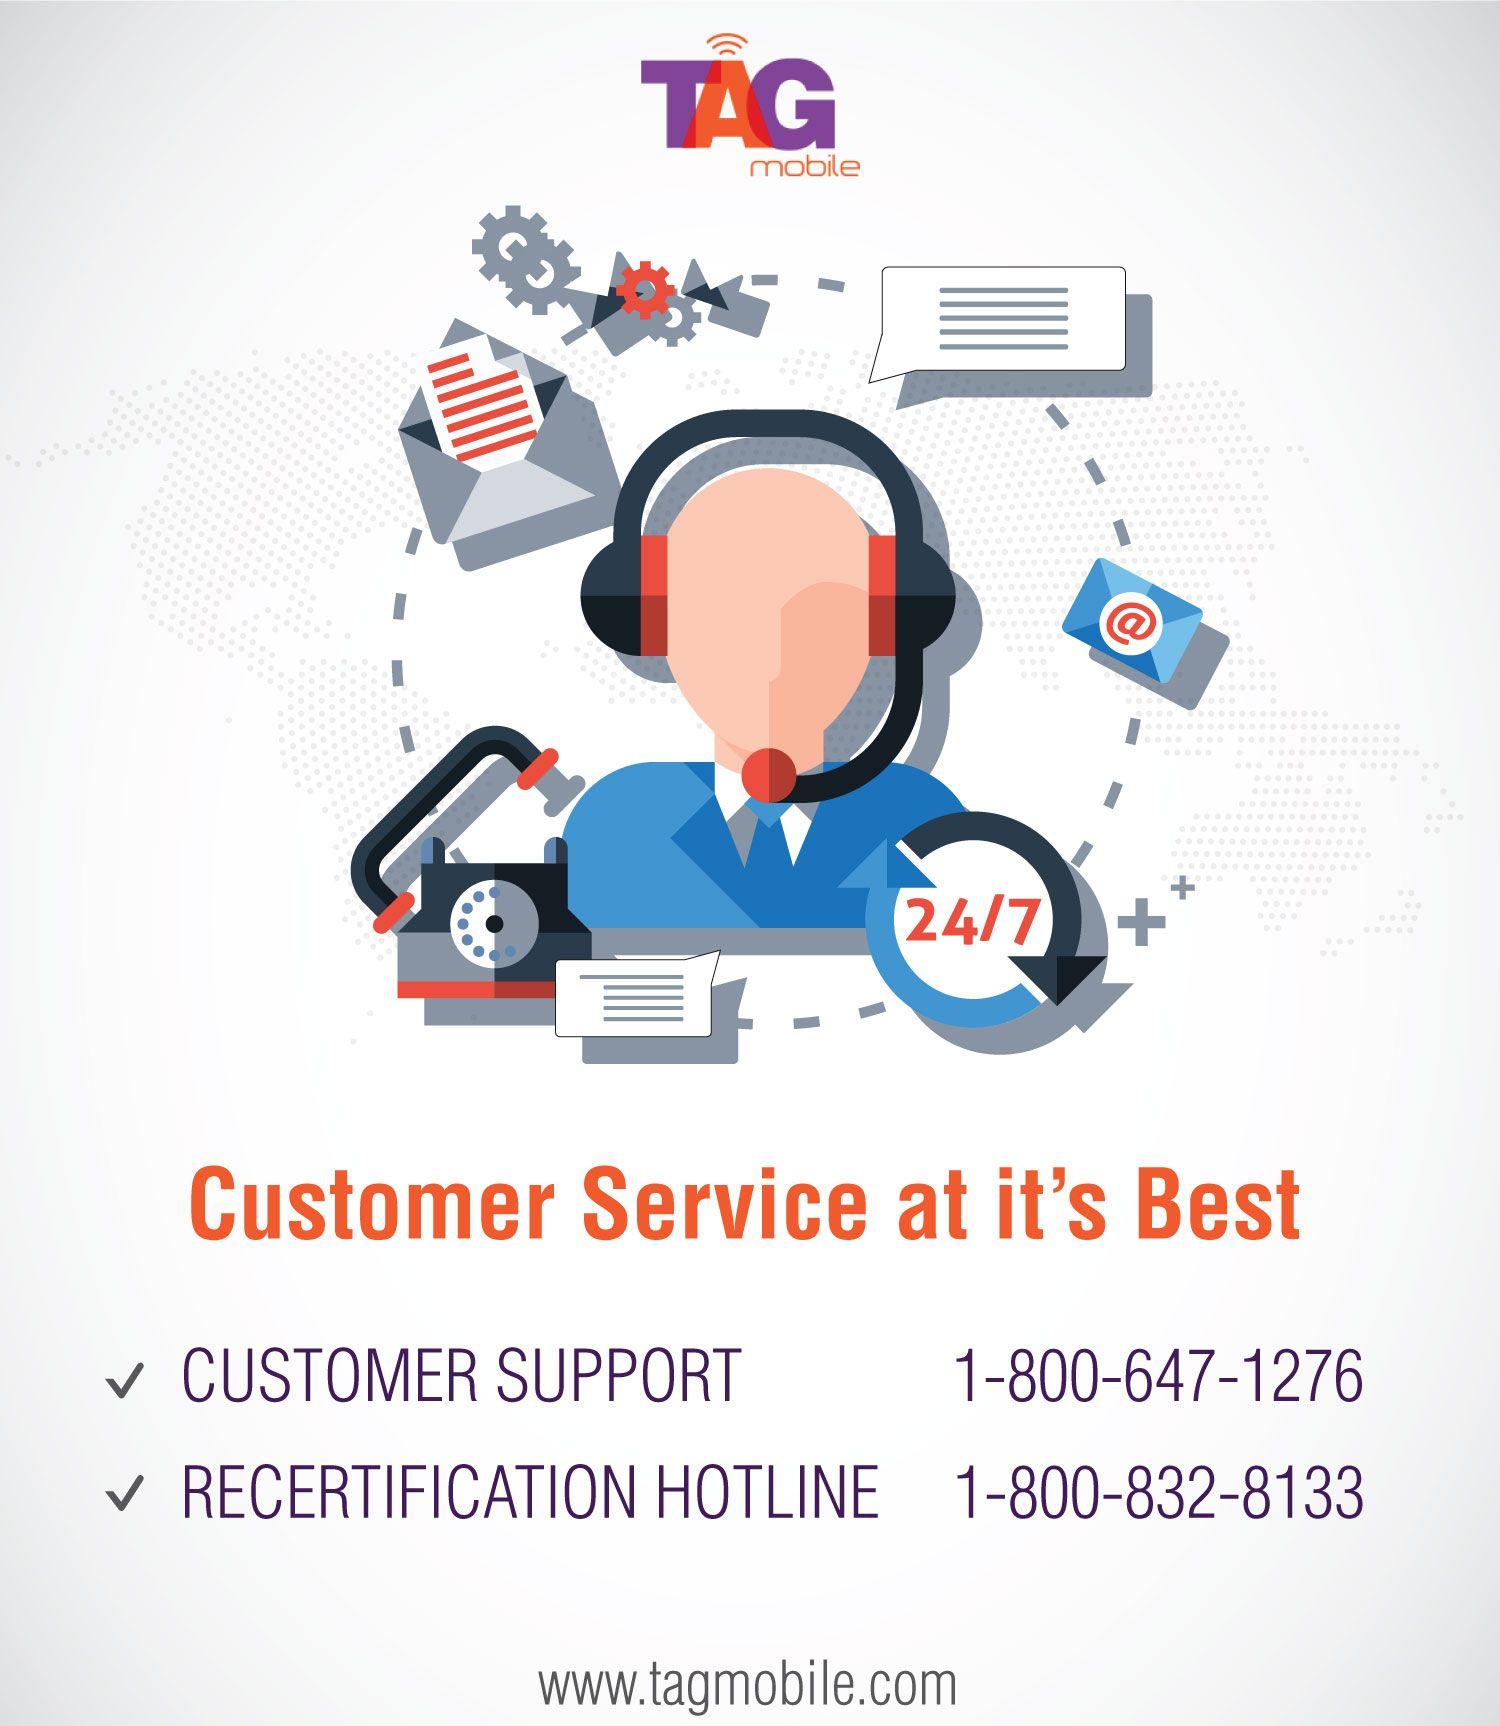 TAG Mobile Customer Care Wireless service, Customer care